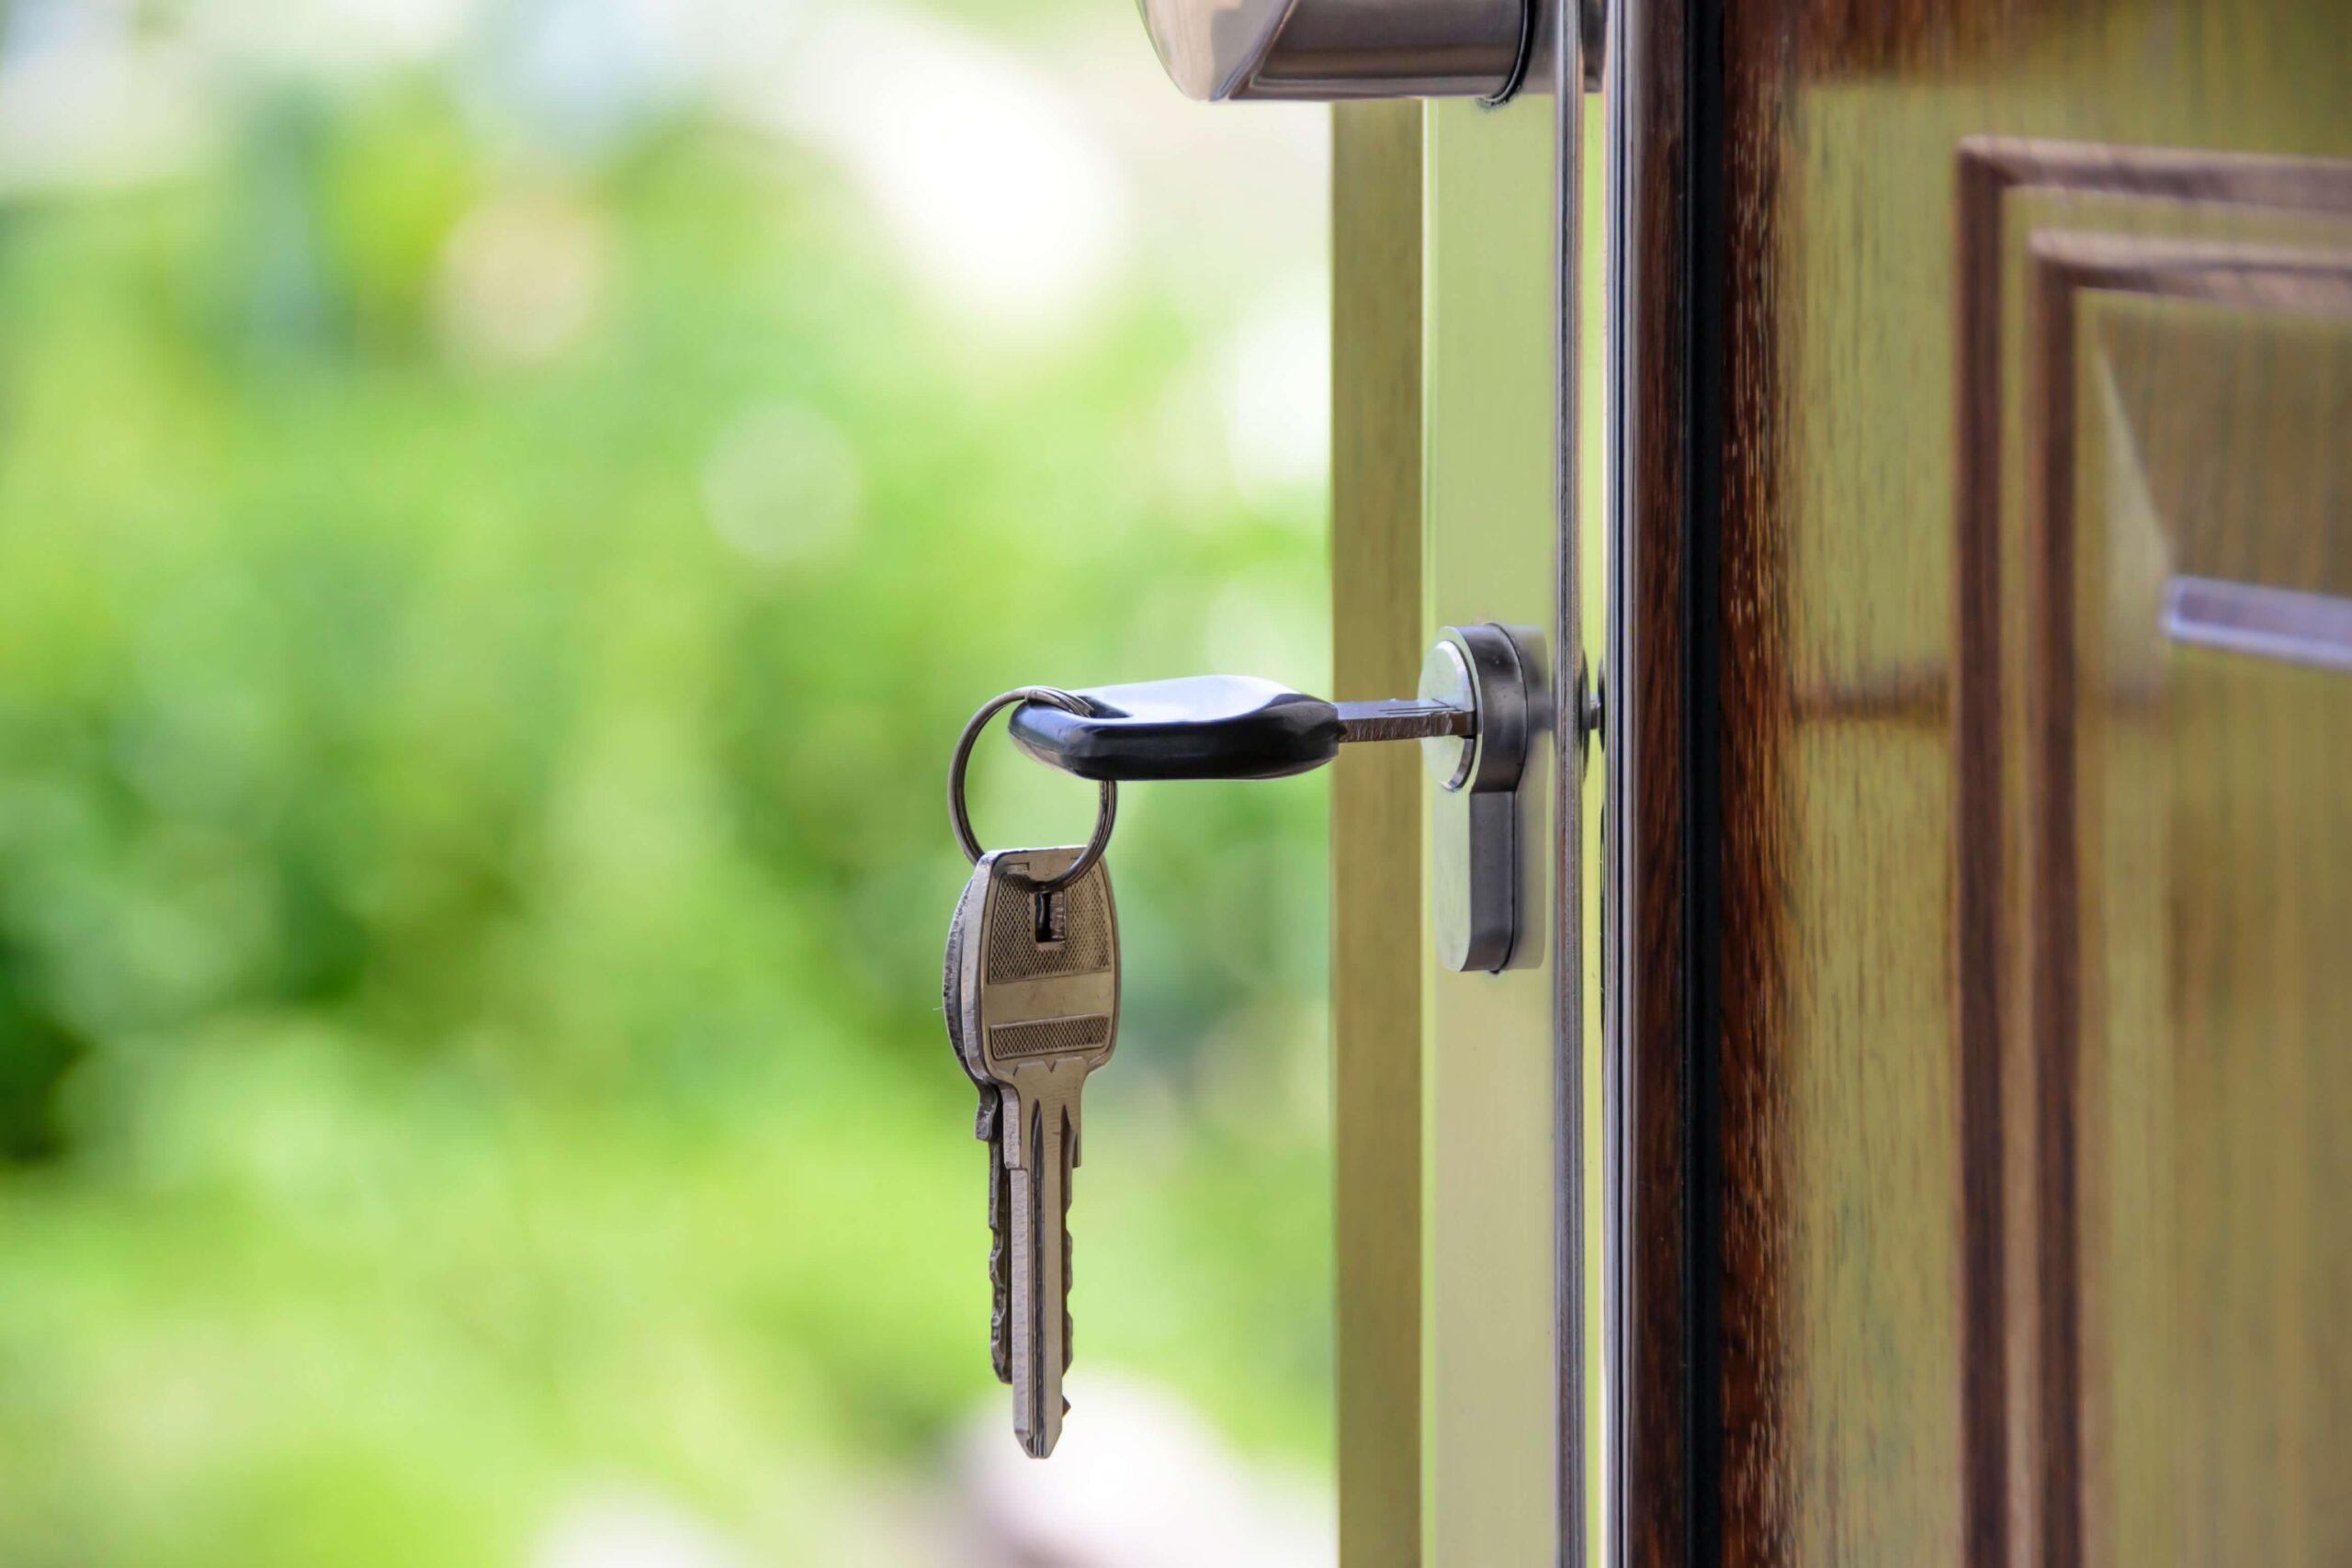 keys and door knob